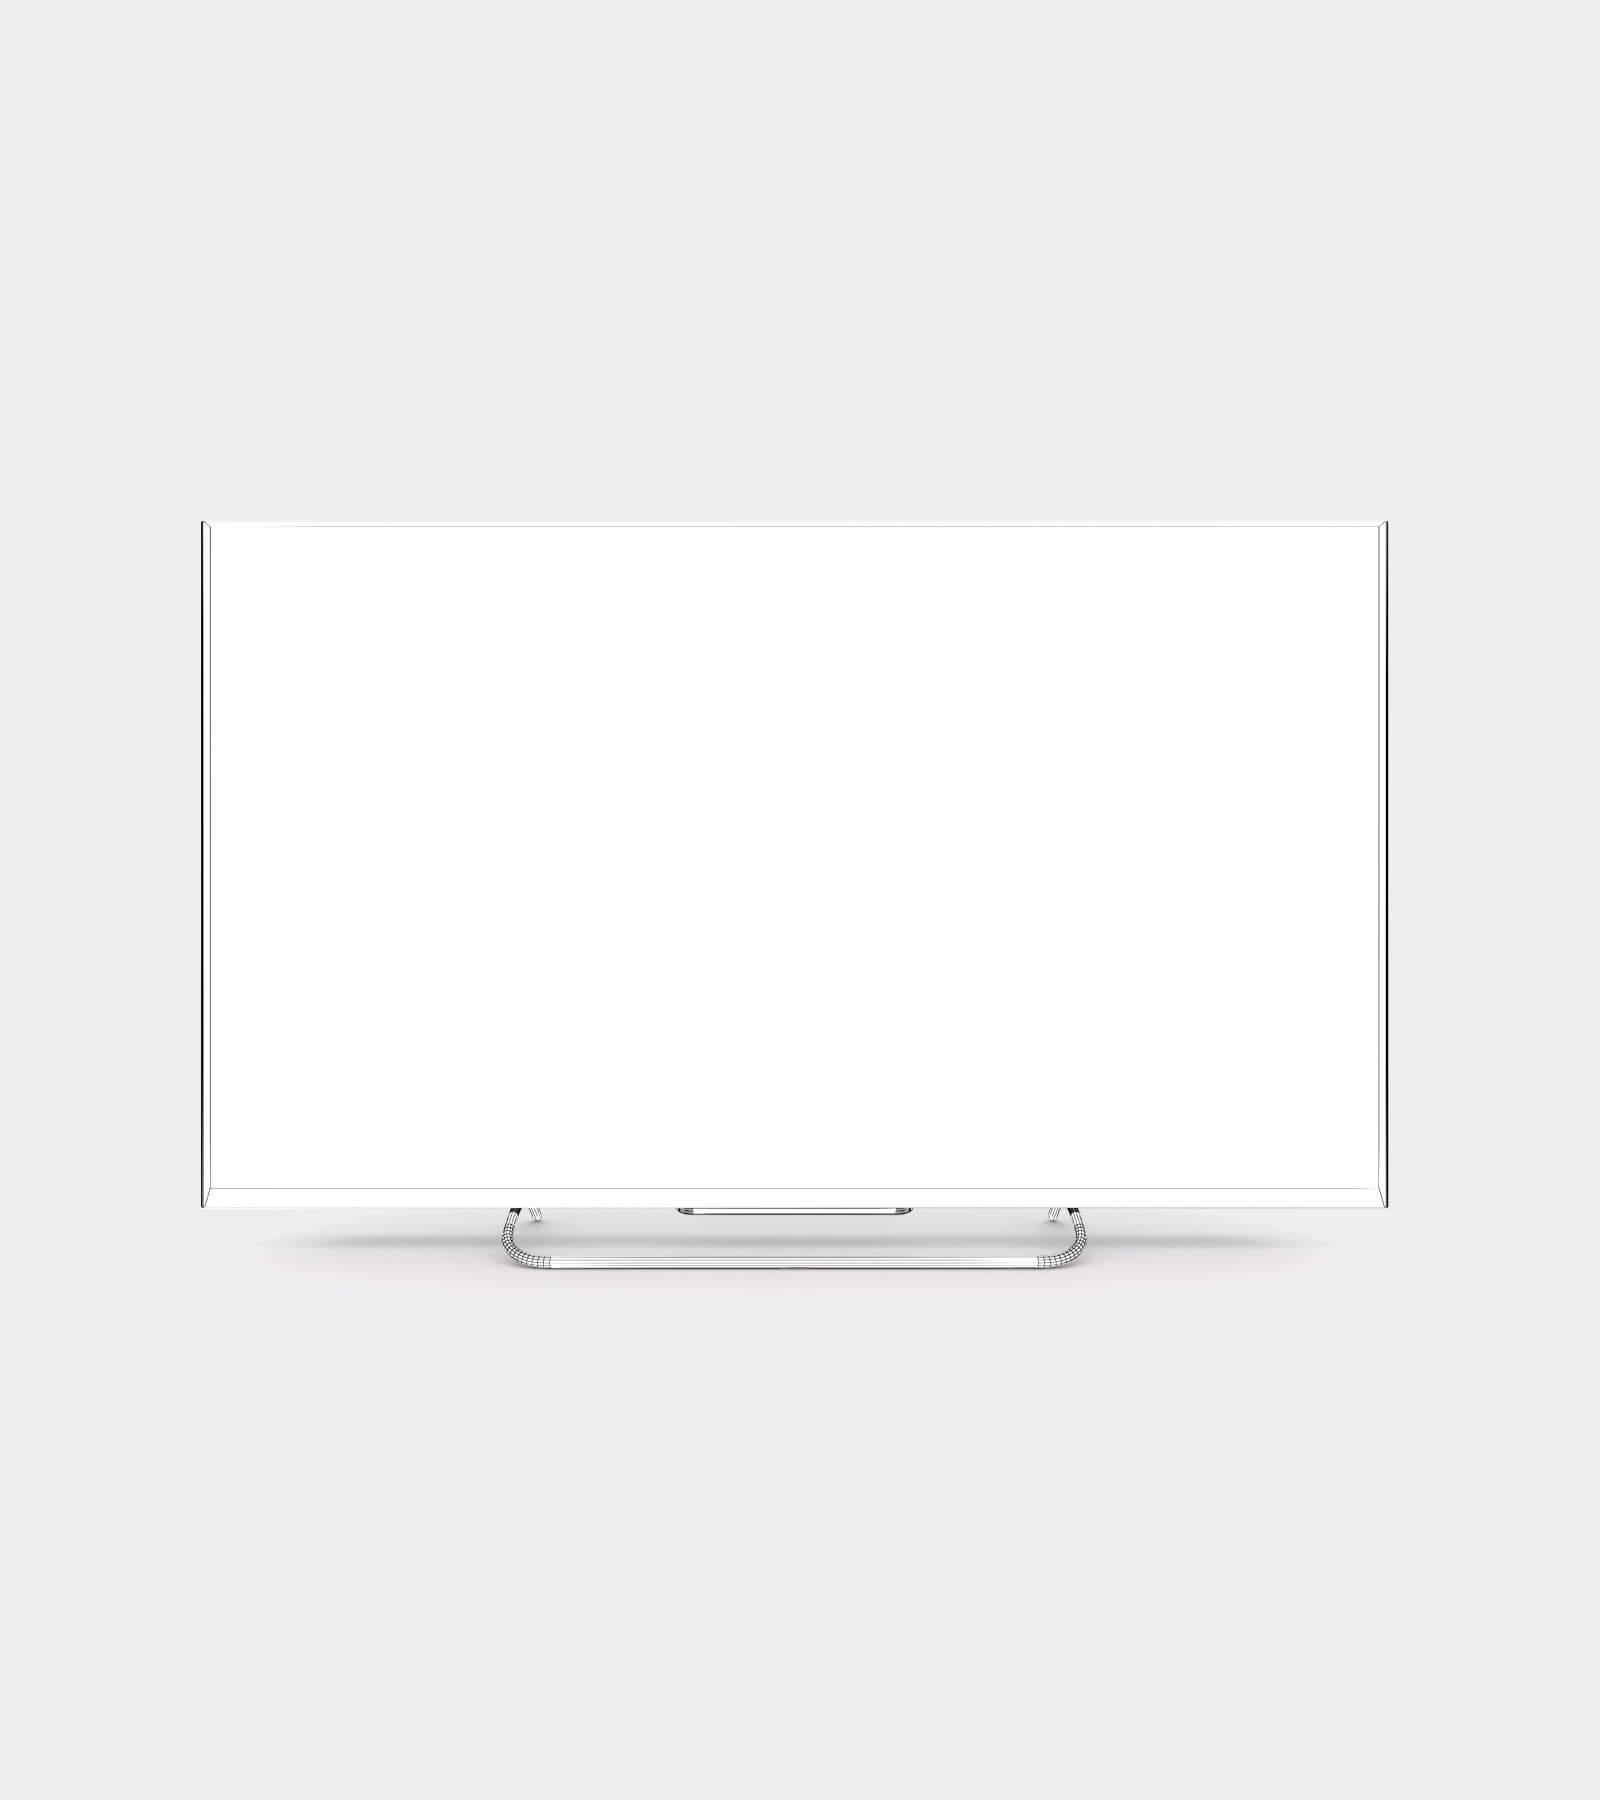 Smart TV-wire-1 3D Model